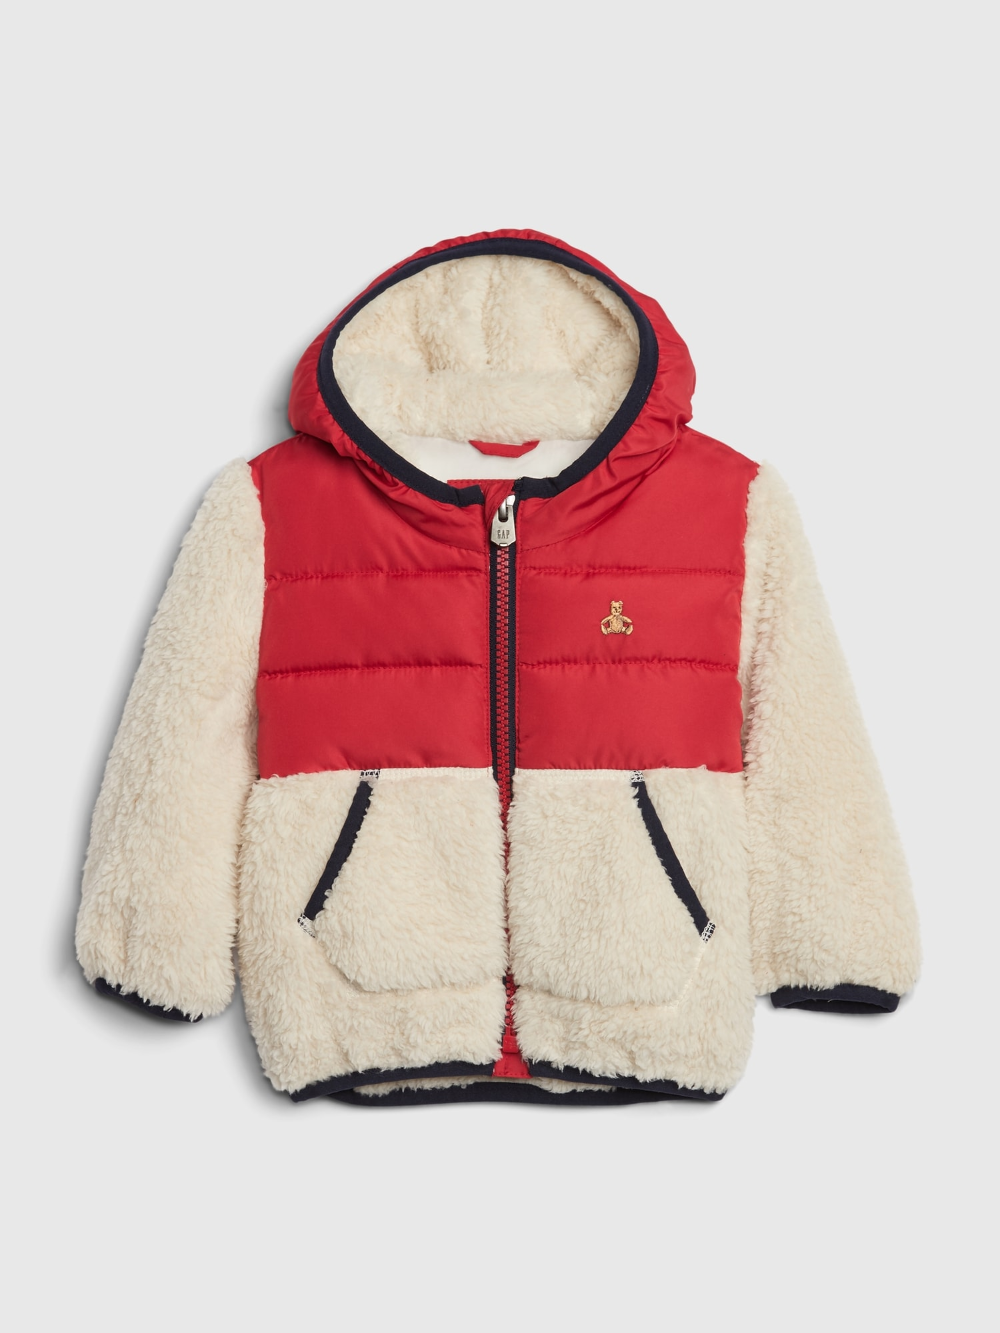 Baby Sherpa Puffer Jacket Gap Puffer Jackets Jackets Puffer [ 1333 x 1000 Pixel ]